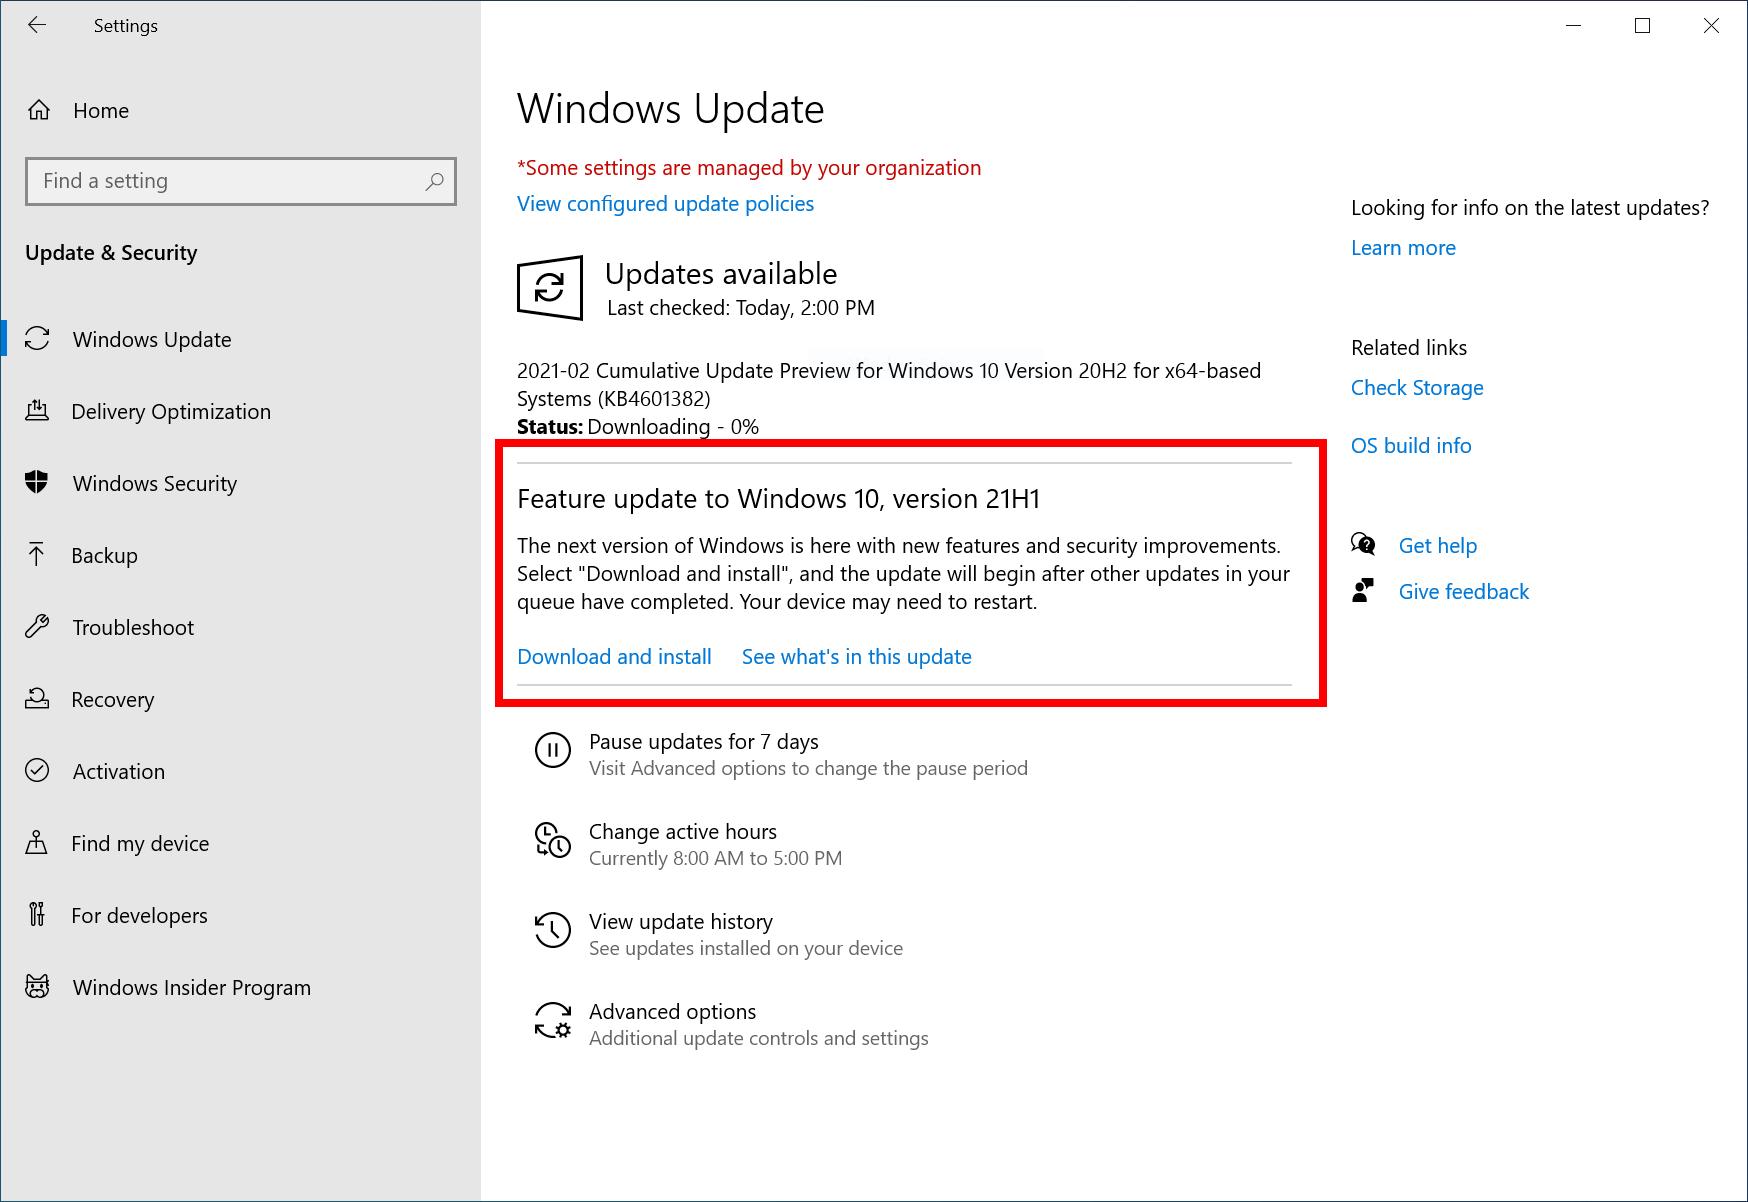 windows 10 version 21h1 feature update